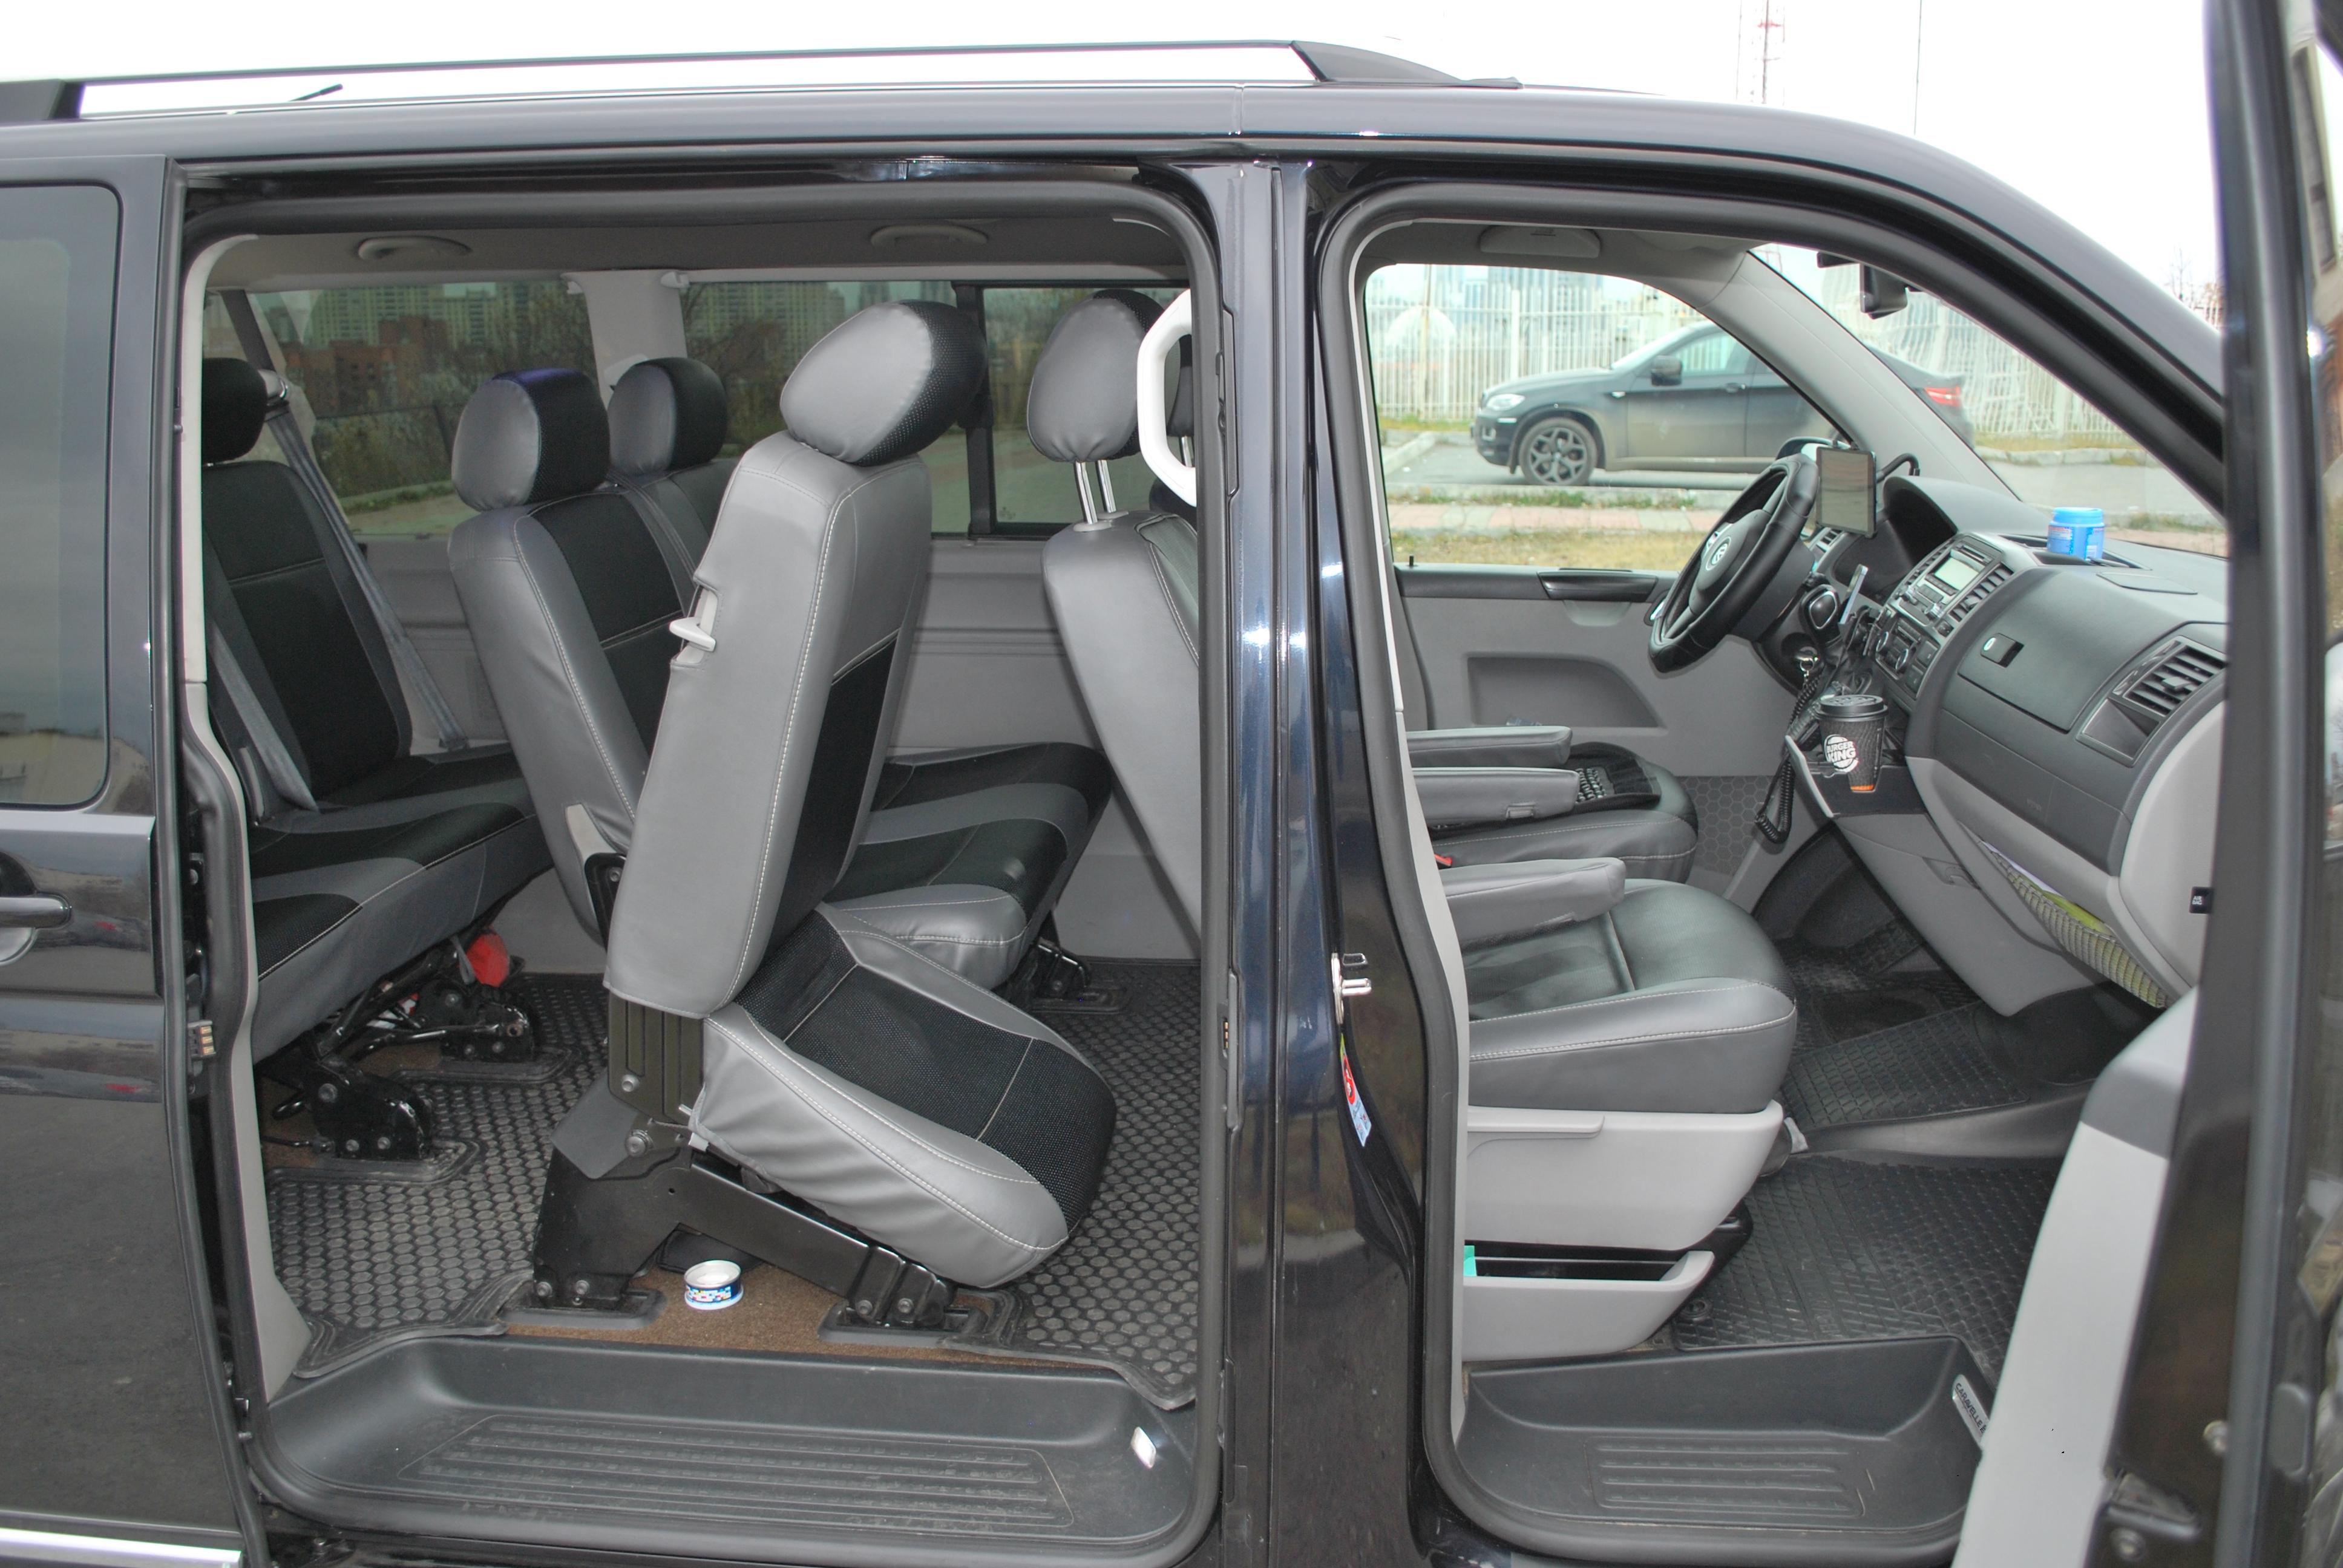 Volkswagen Caravelle Park